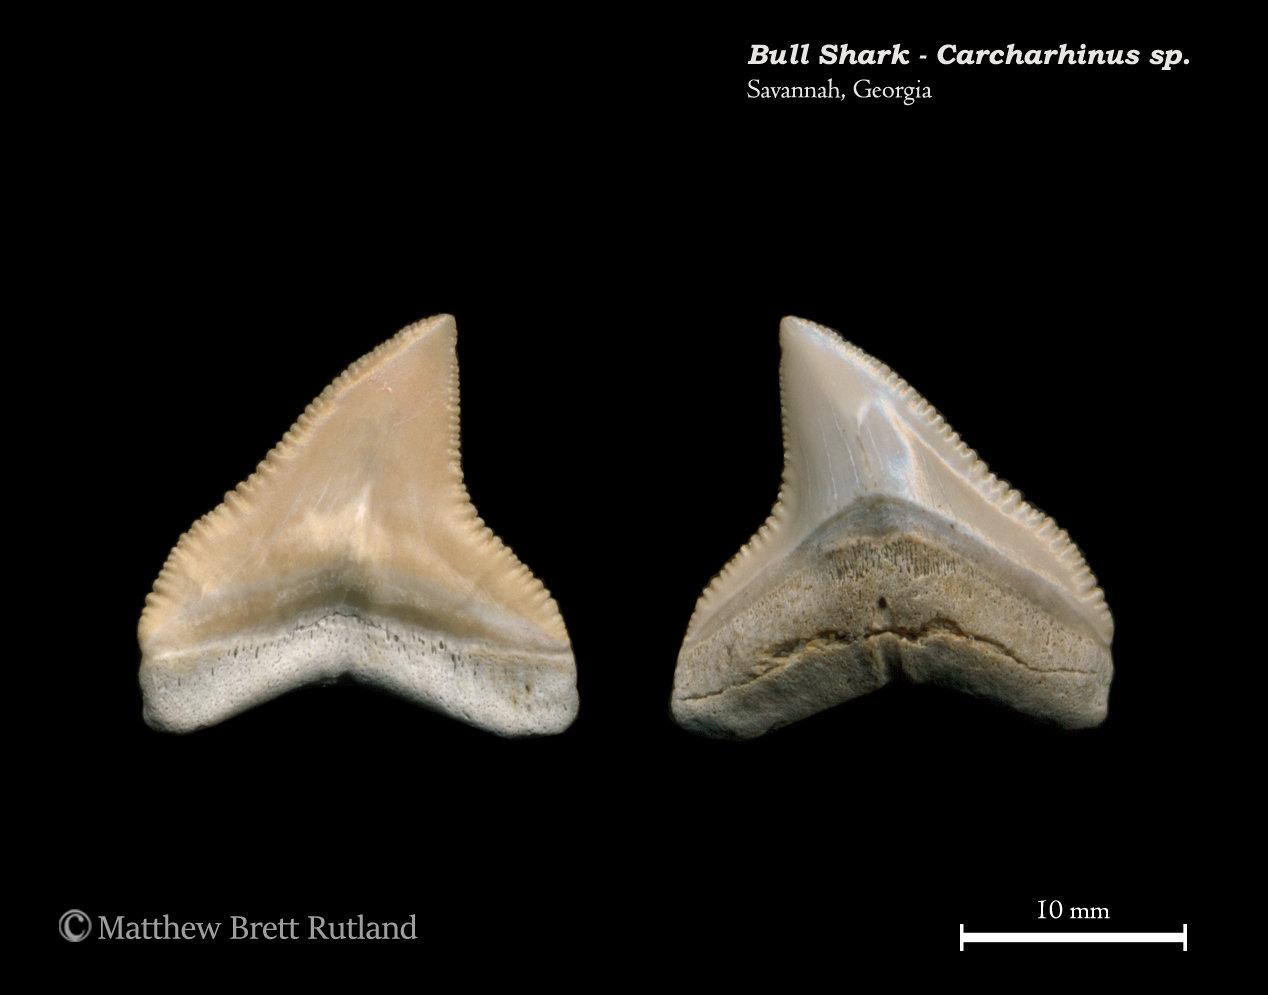 Carcharhinus sp. 03